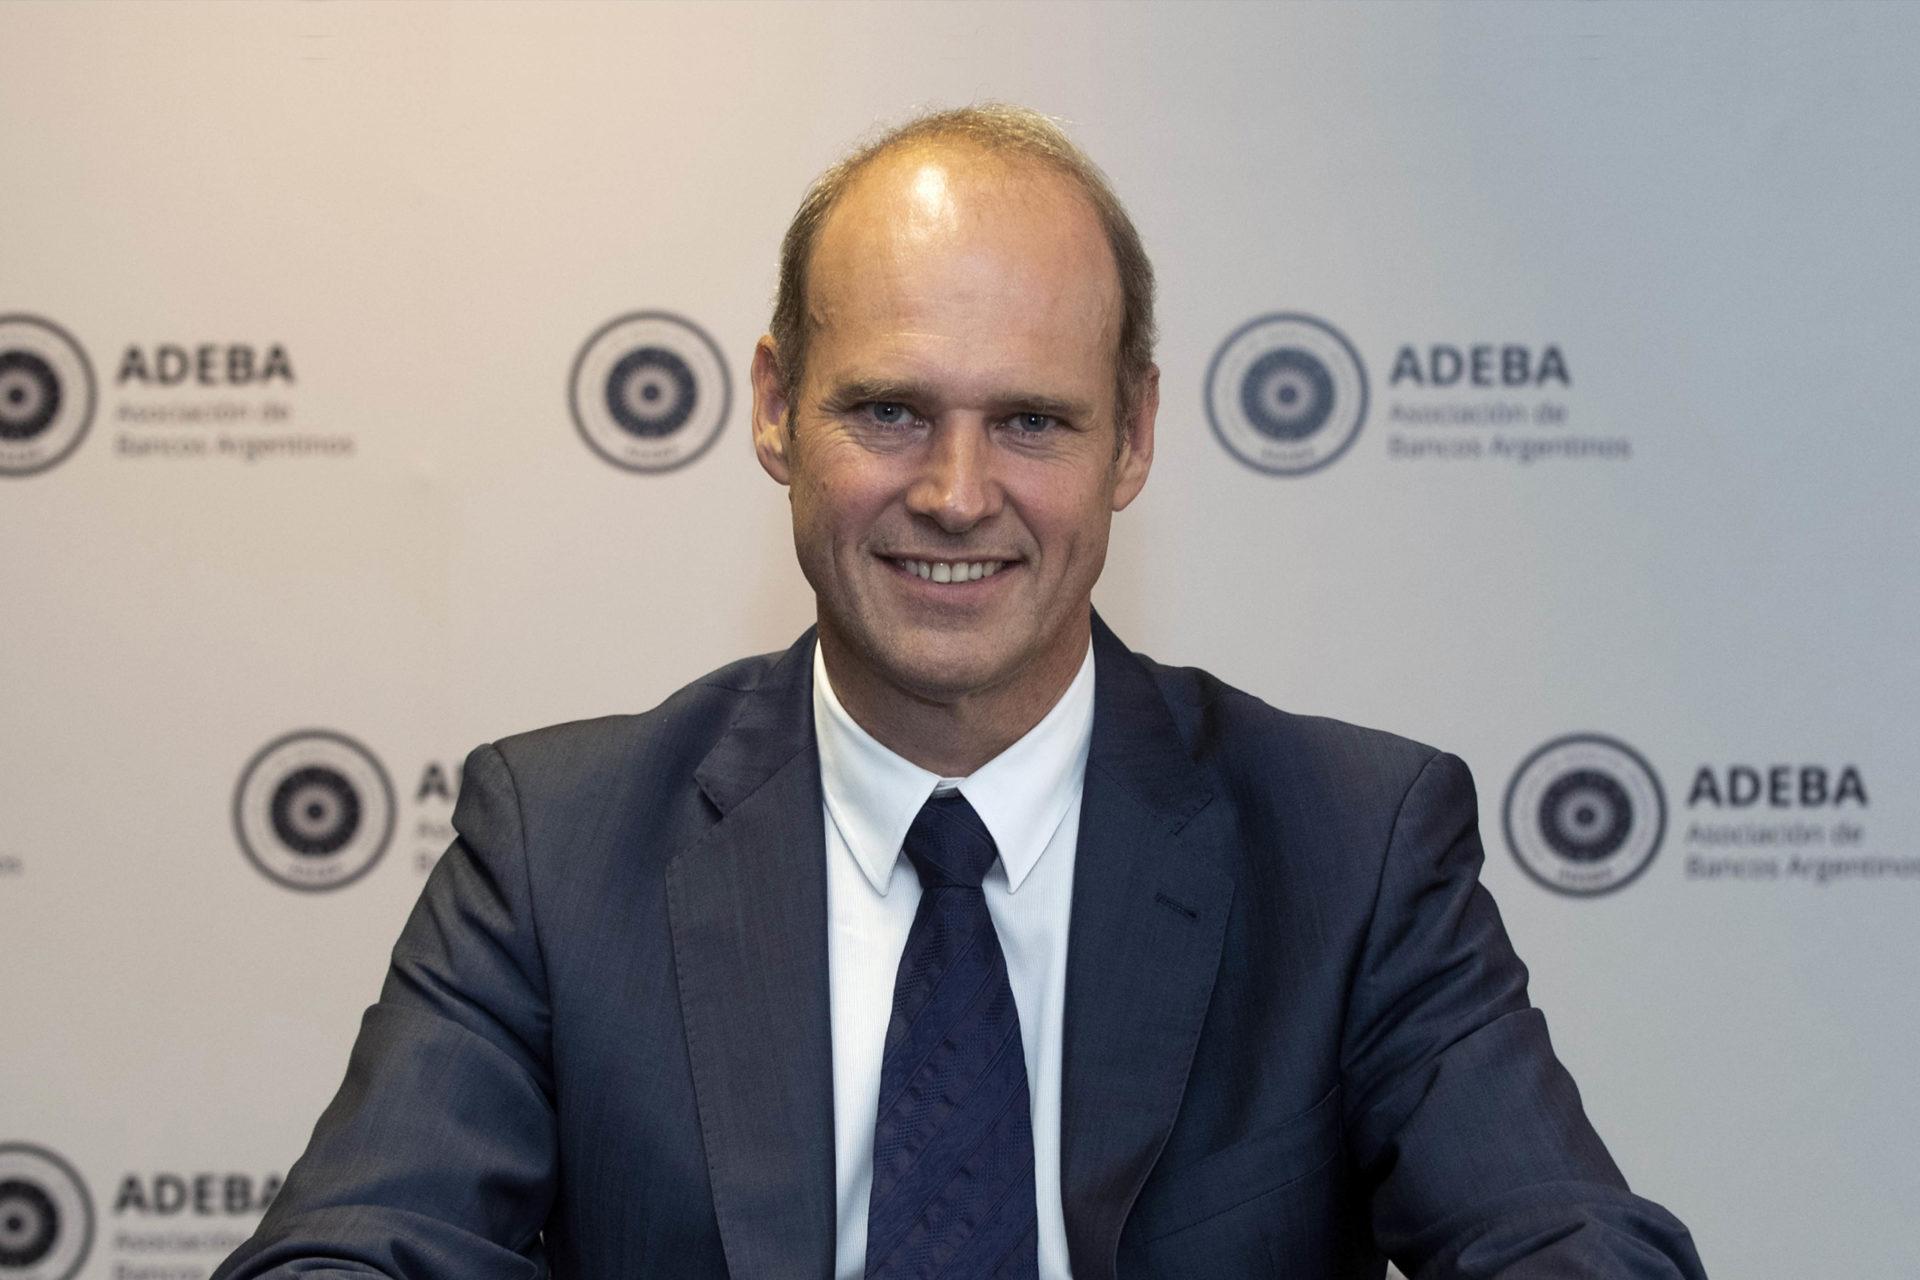 Asume Javier Bolzico la presidencia de ADEBA